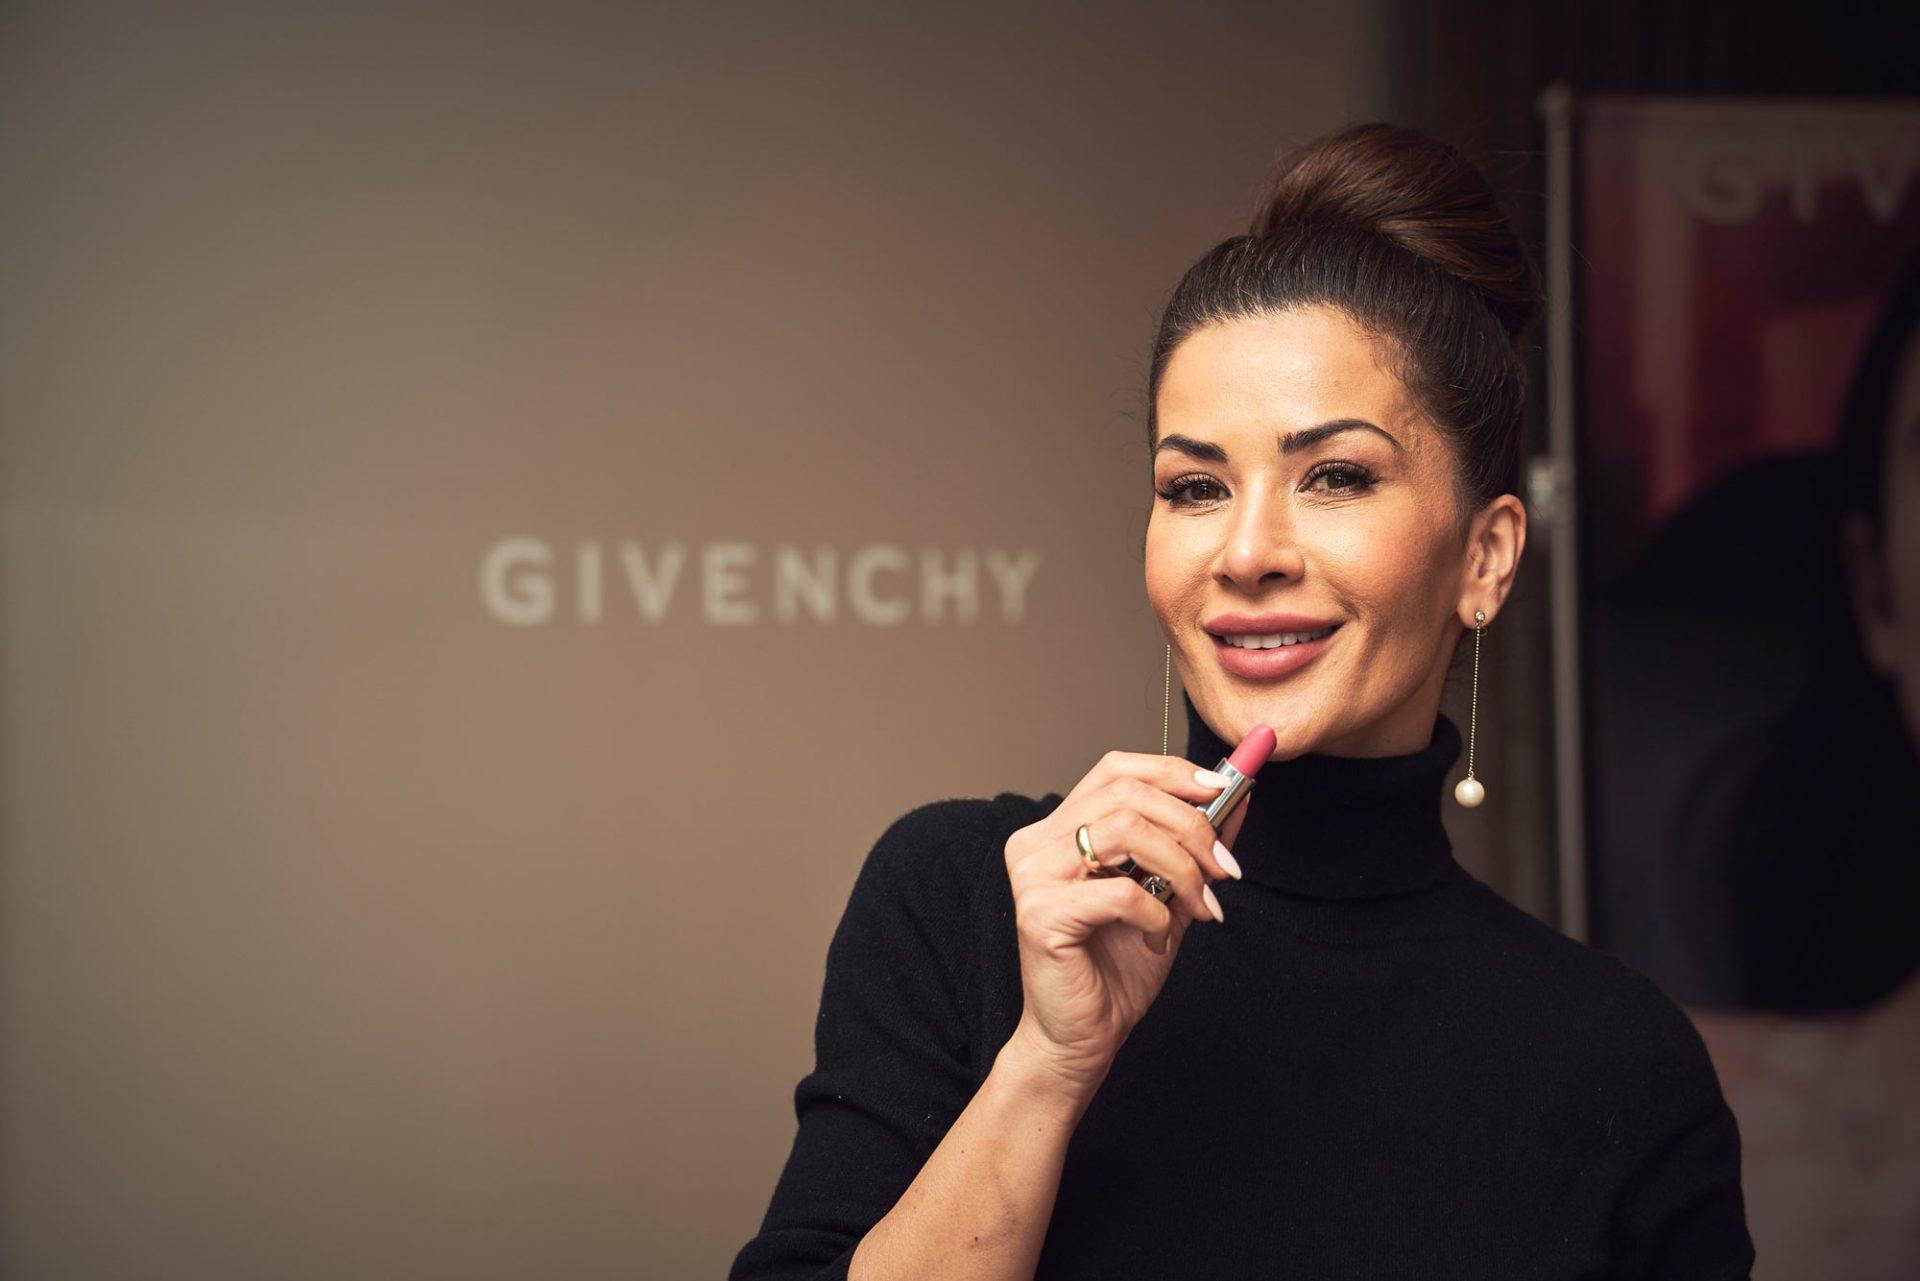 Givenchy Event Müchen - Fotodokumentation